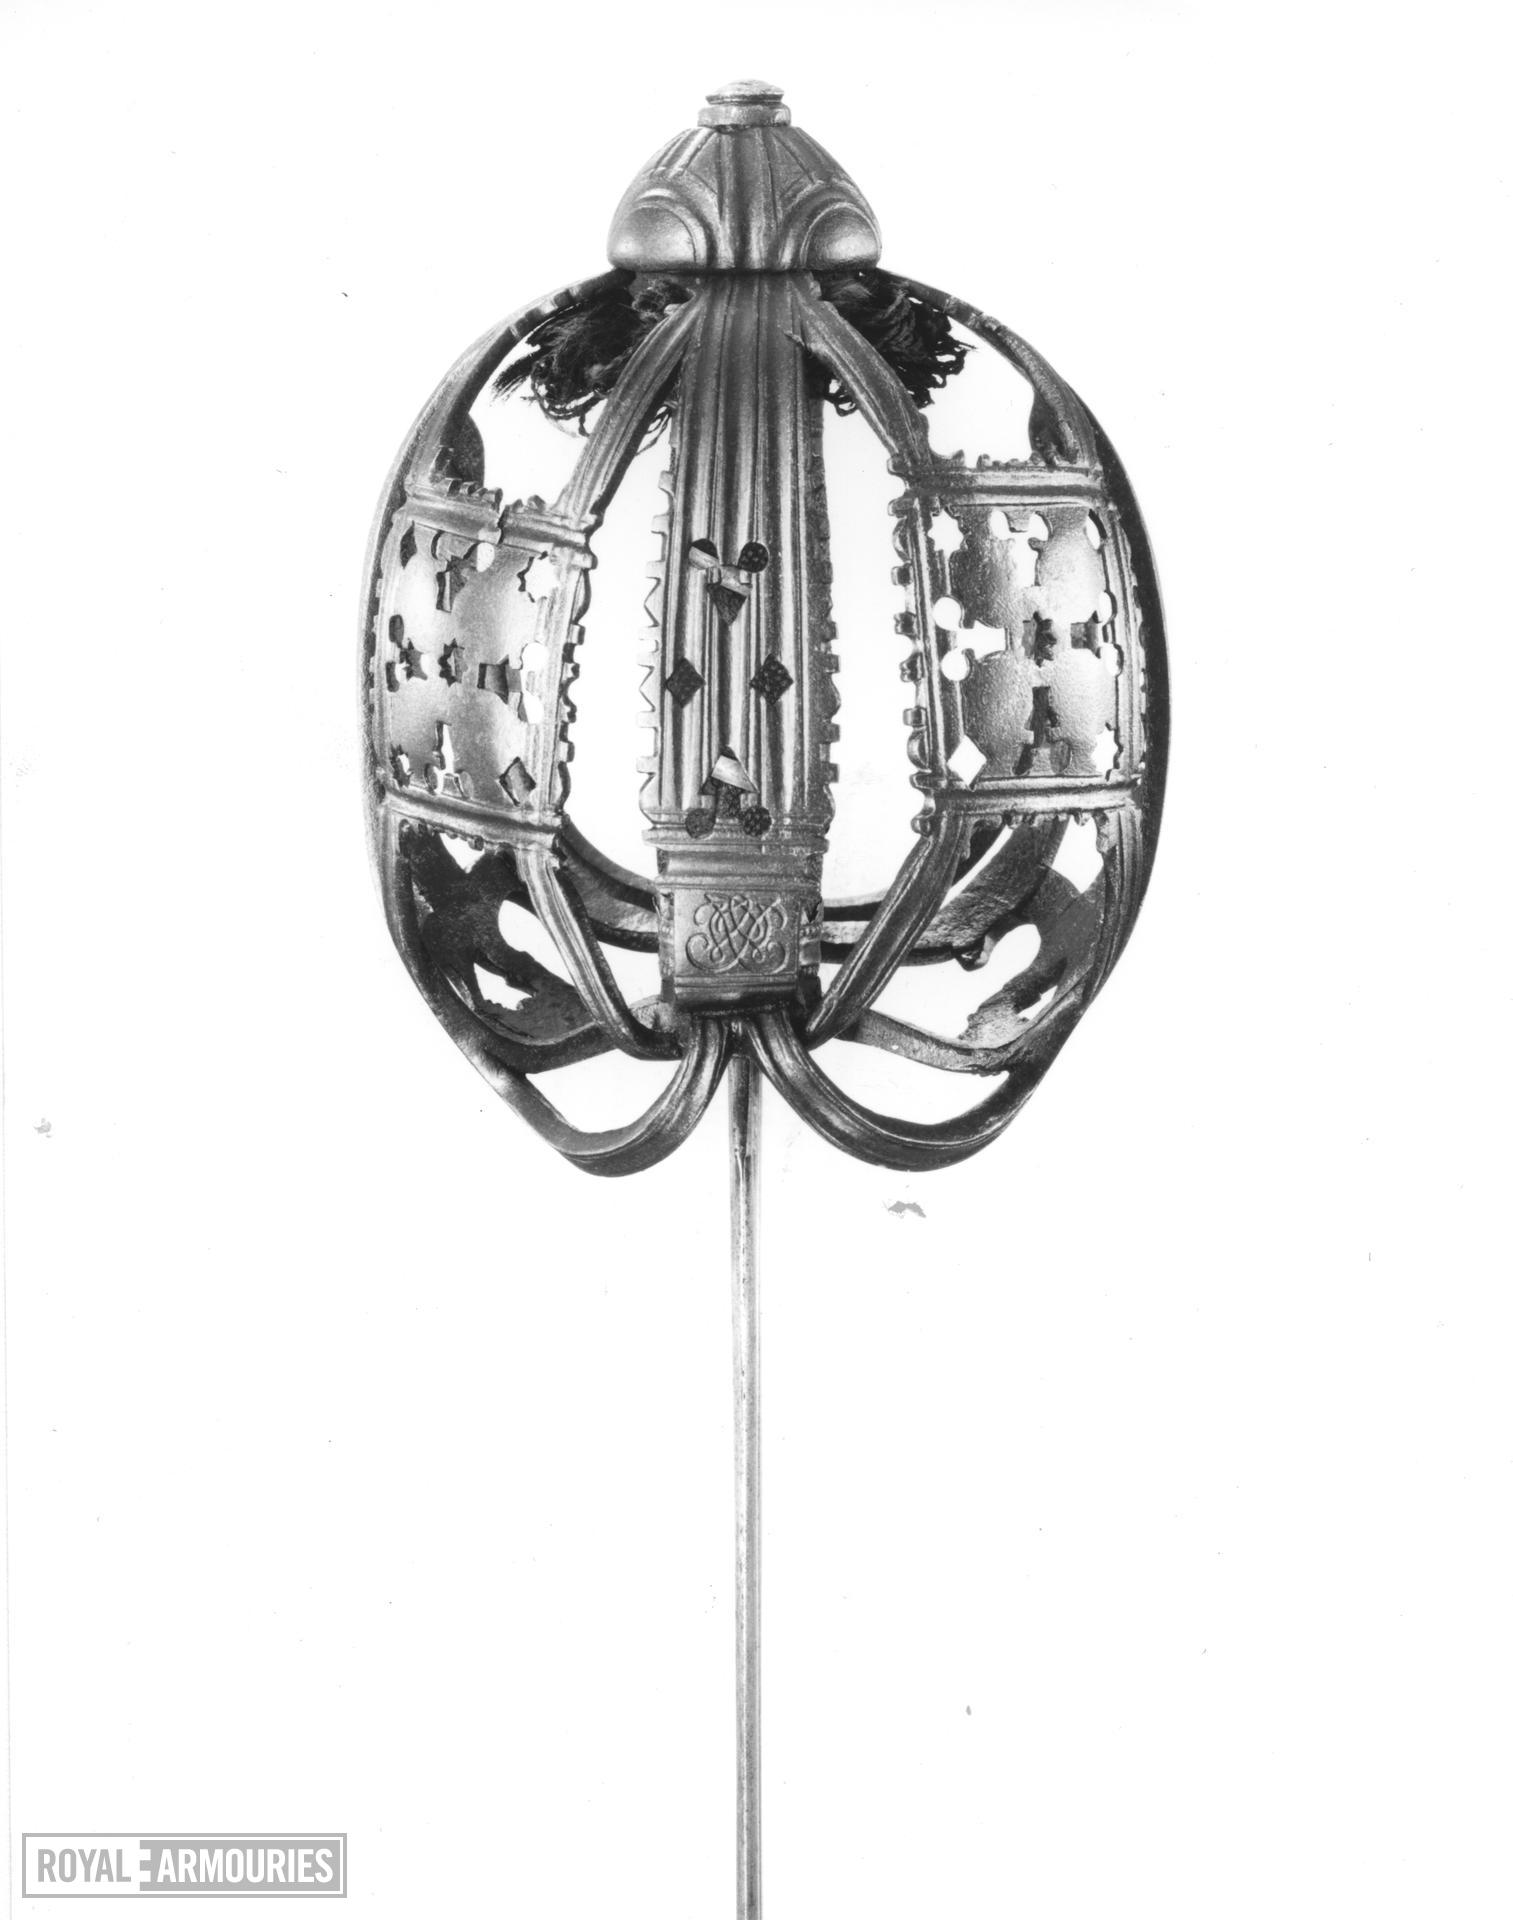 Basket hilted sword Hilt by John Simpson of Glasgow